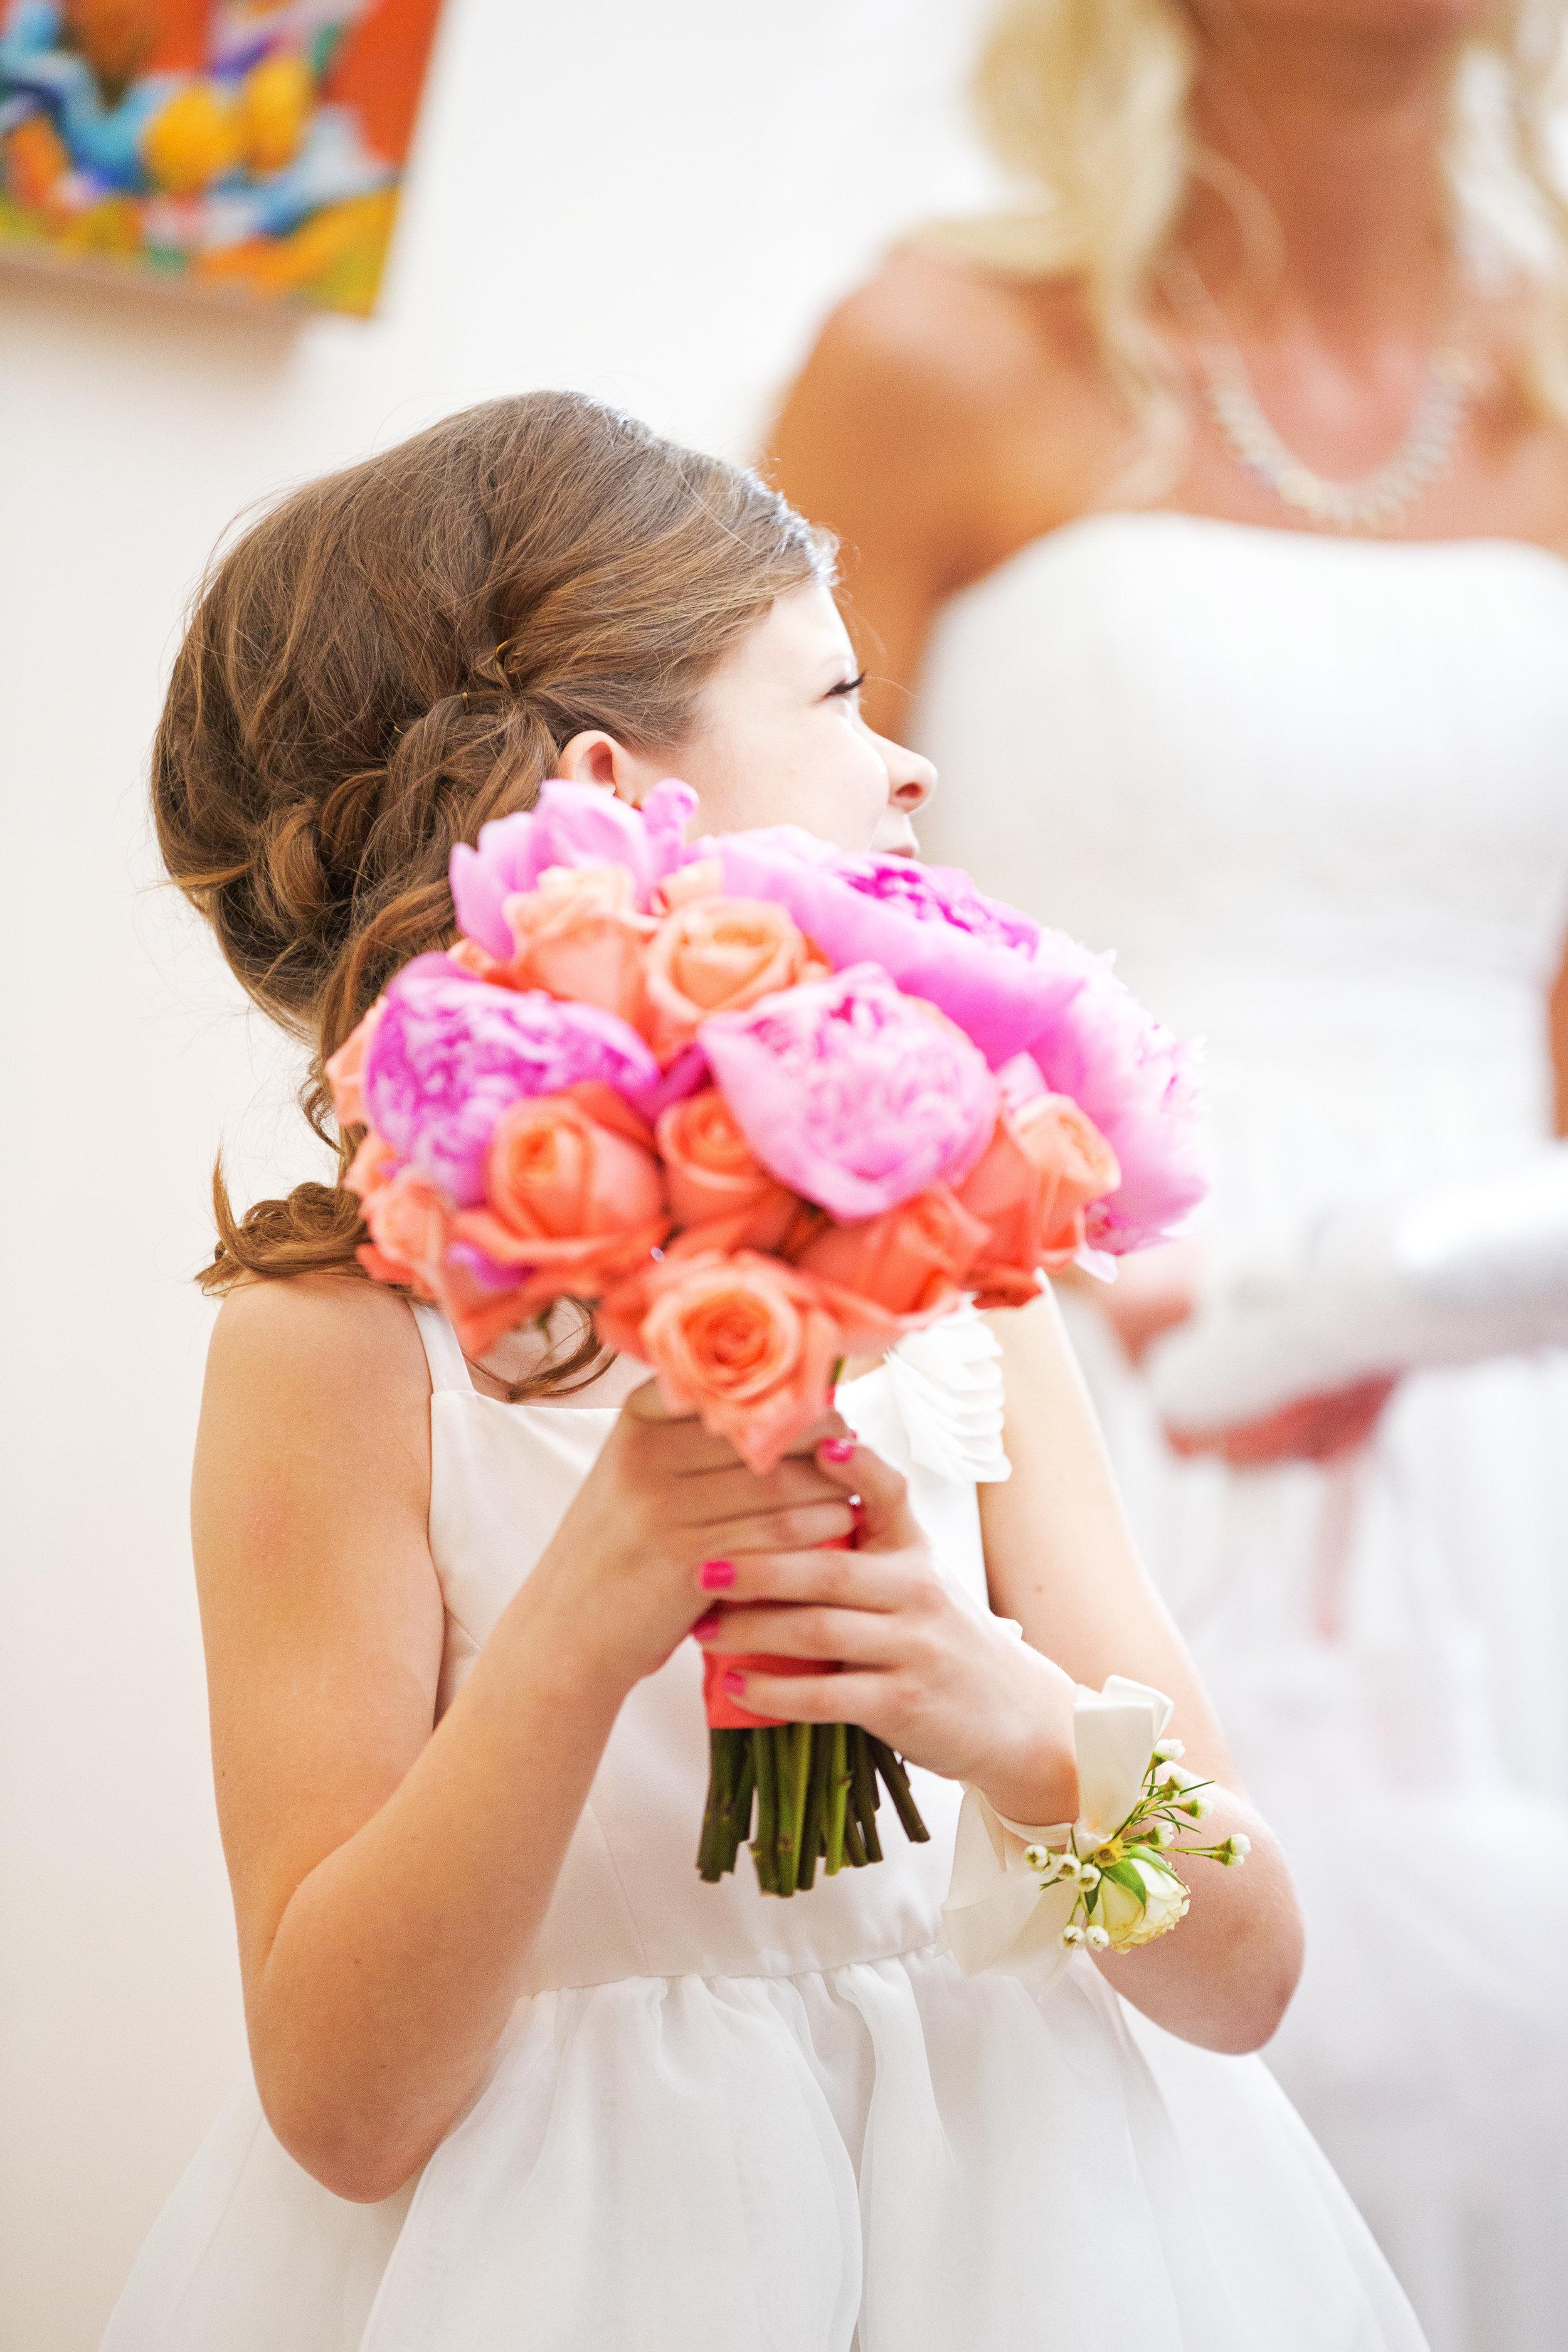 Flower girl with bride_s bouquet.jpg